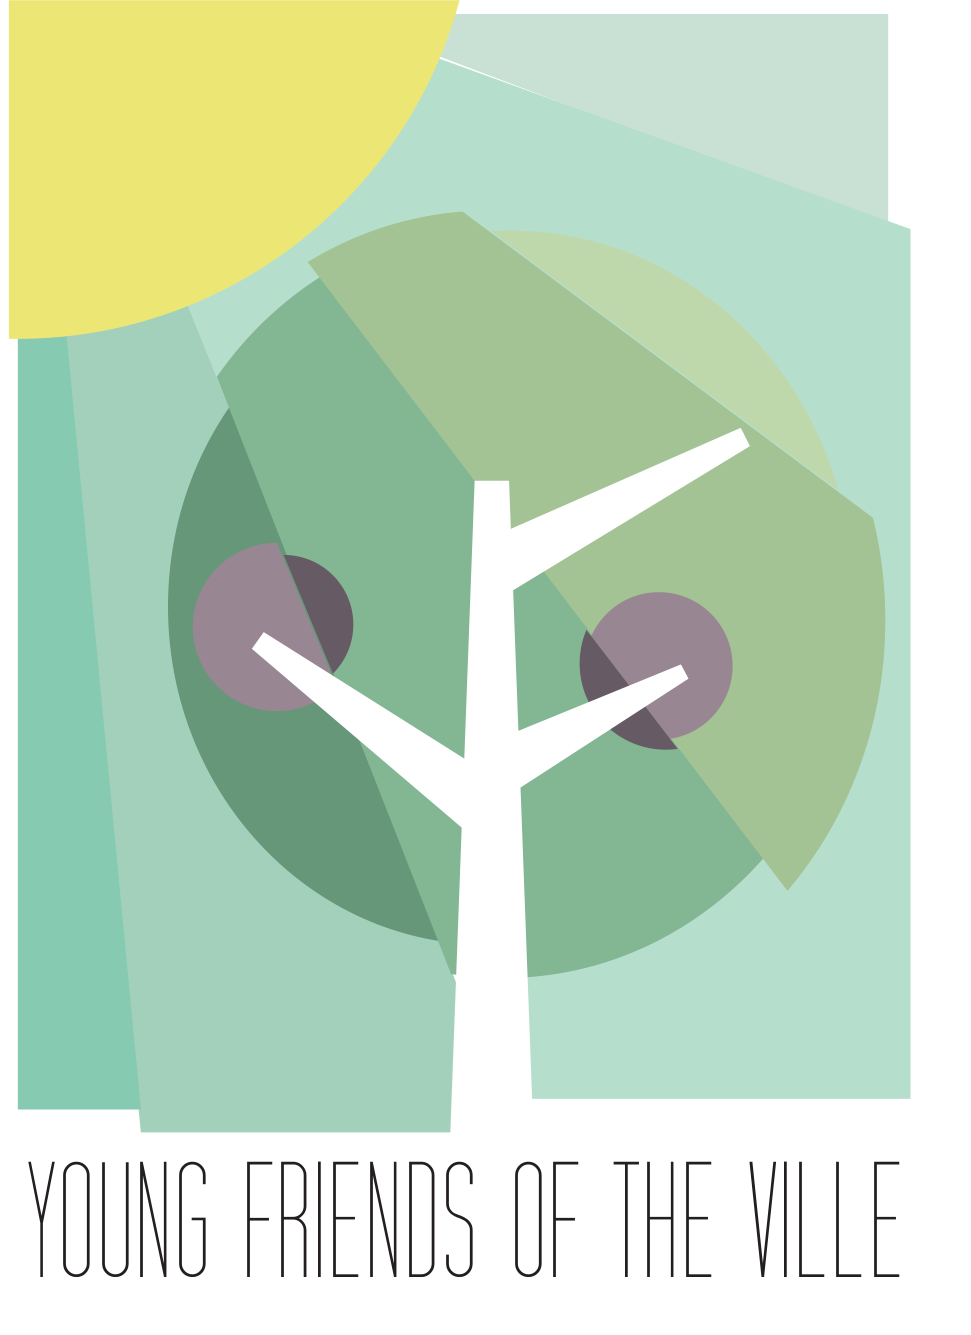 Young Friends Logo - no border.png